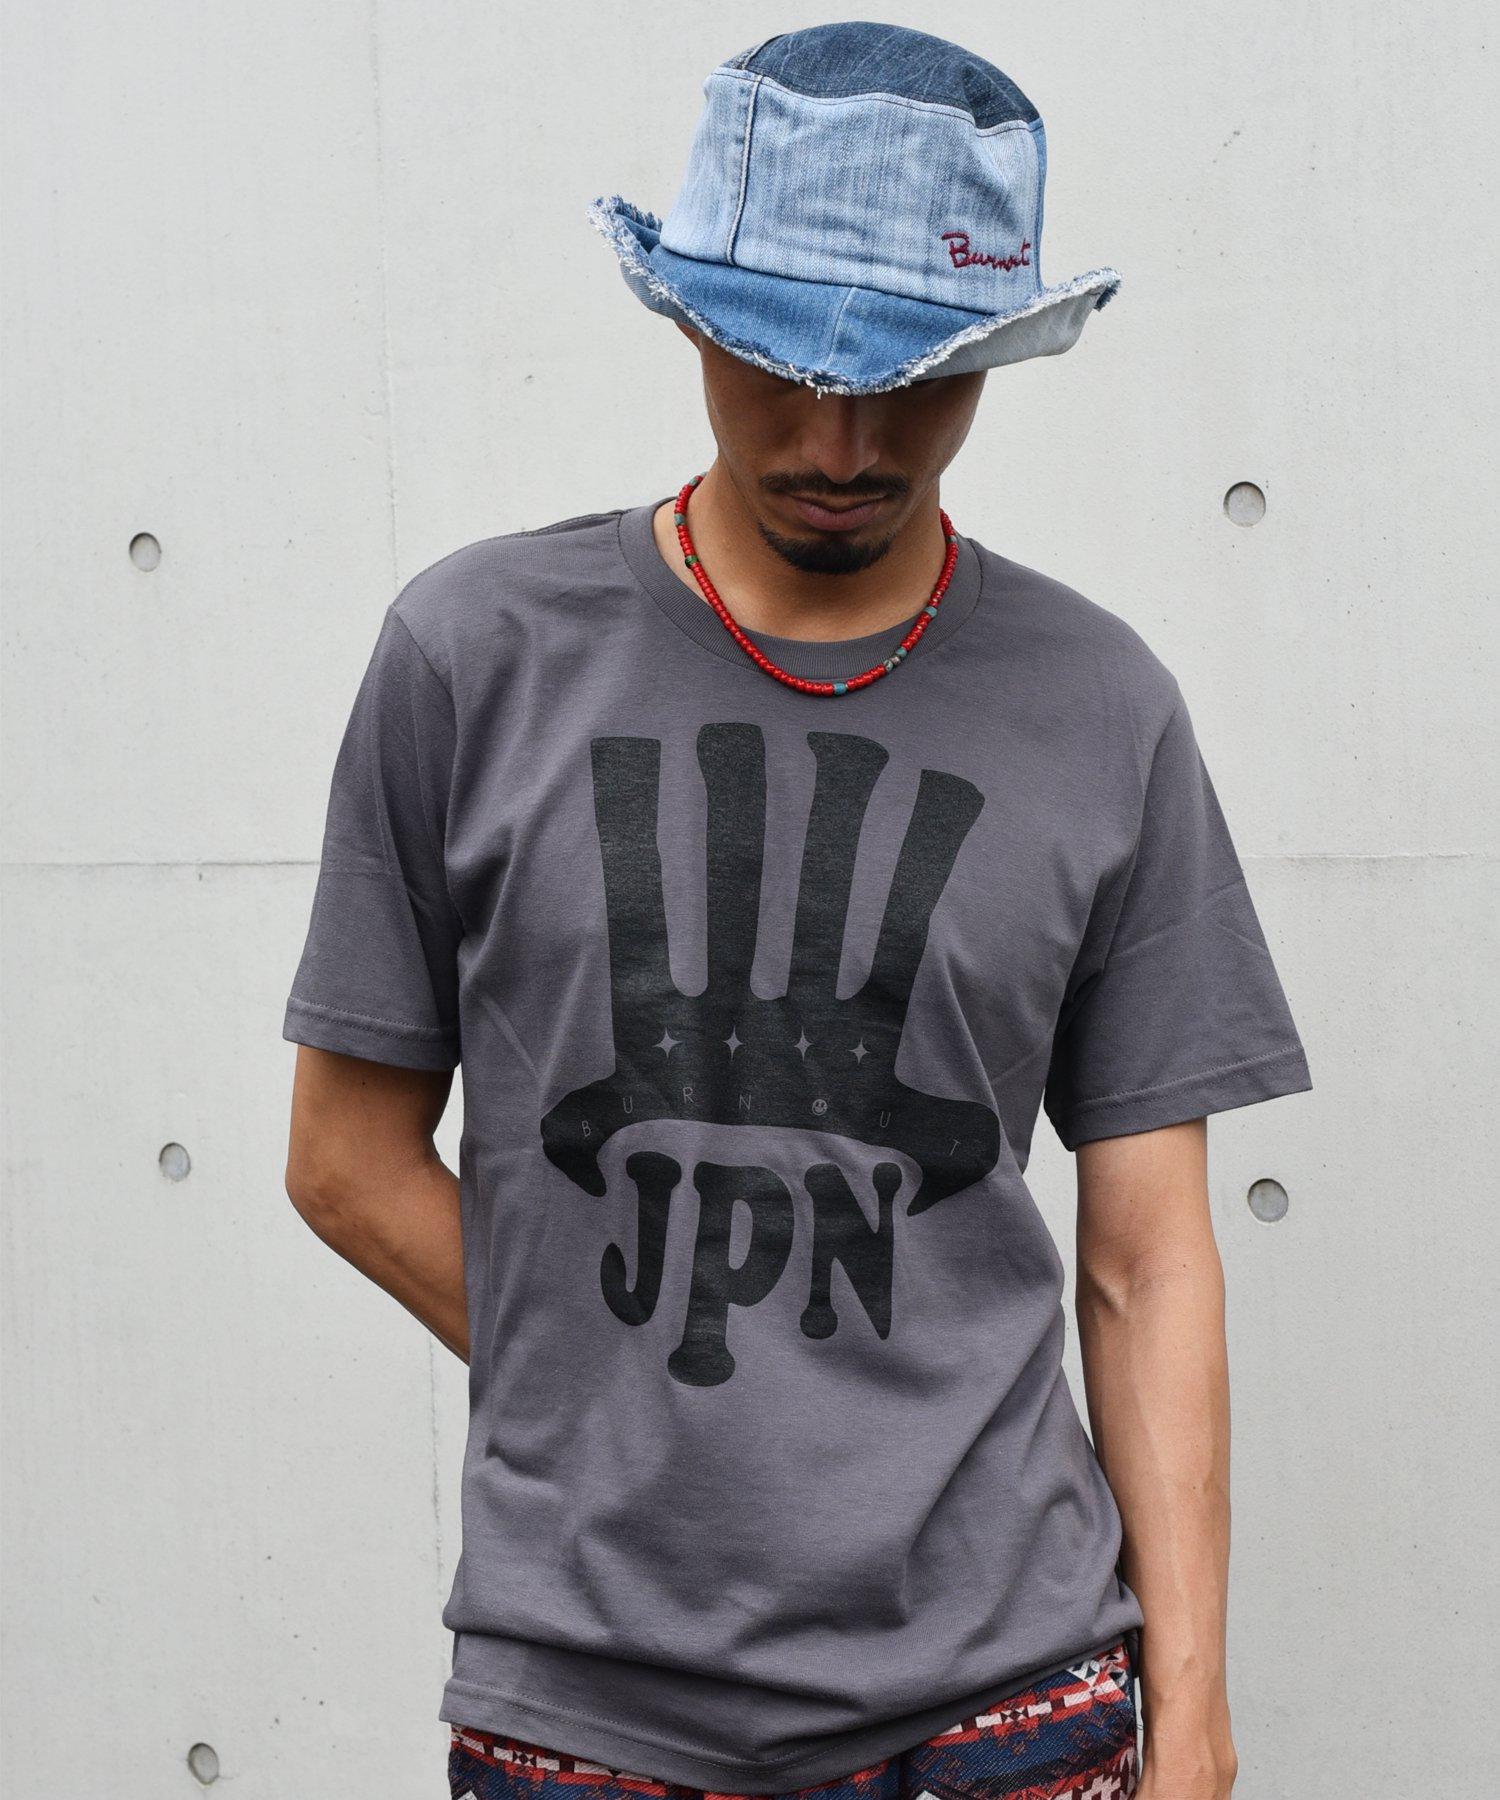 <img class='new_mark_img1' src='https://img.shop-pro.jp/img/new/icons15.gif' style='border:none;display:inline;margin:0px;padding:0px;width:auto;' />Burnout(バーンアウト) JPN T-shirt / チャコール